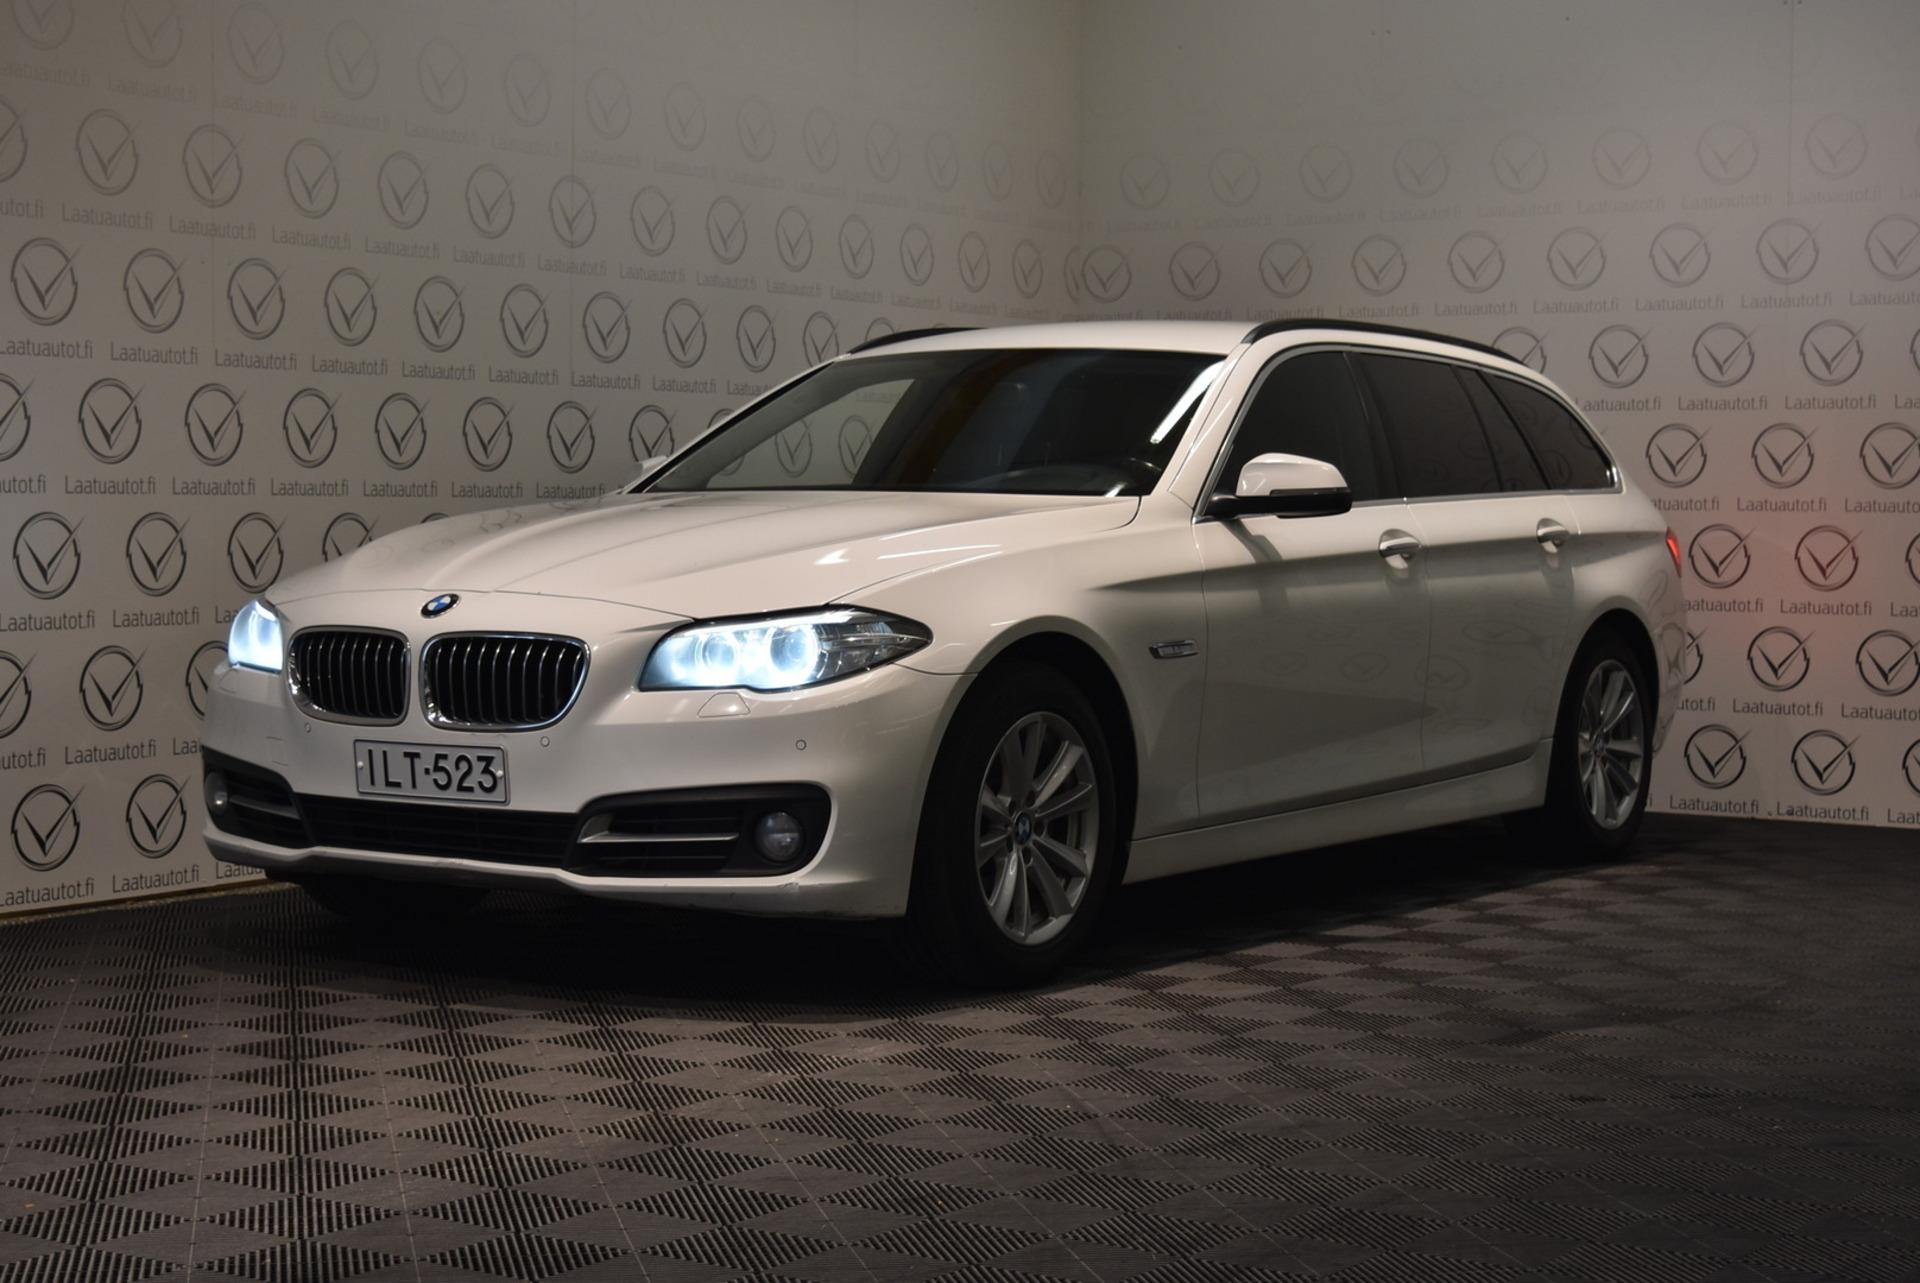 BMW 518 F11 Touring 518d TwinPower Turbo A Business Exclusive - Rahoitus 1.89% jopa ilman käsirahaa! Sportnahat,  Cruise,  Xenon,  PDC